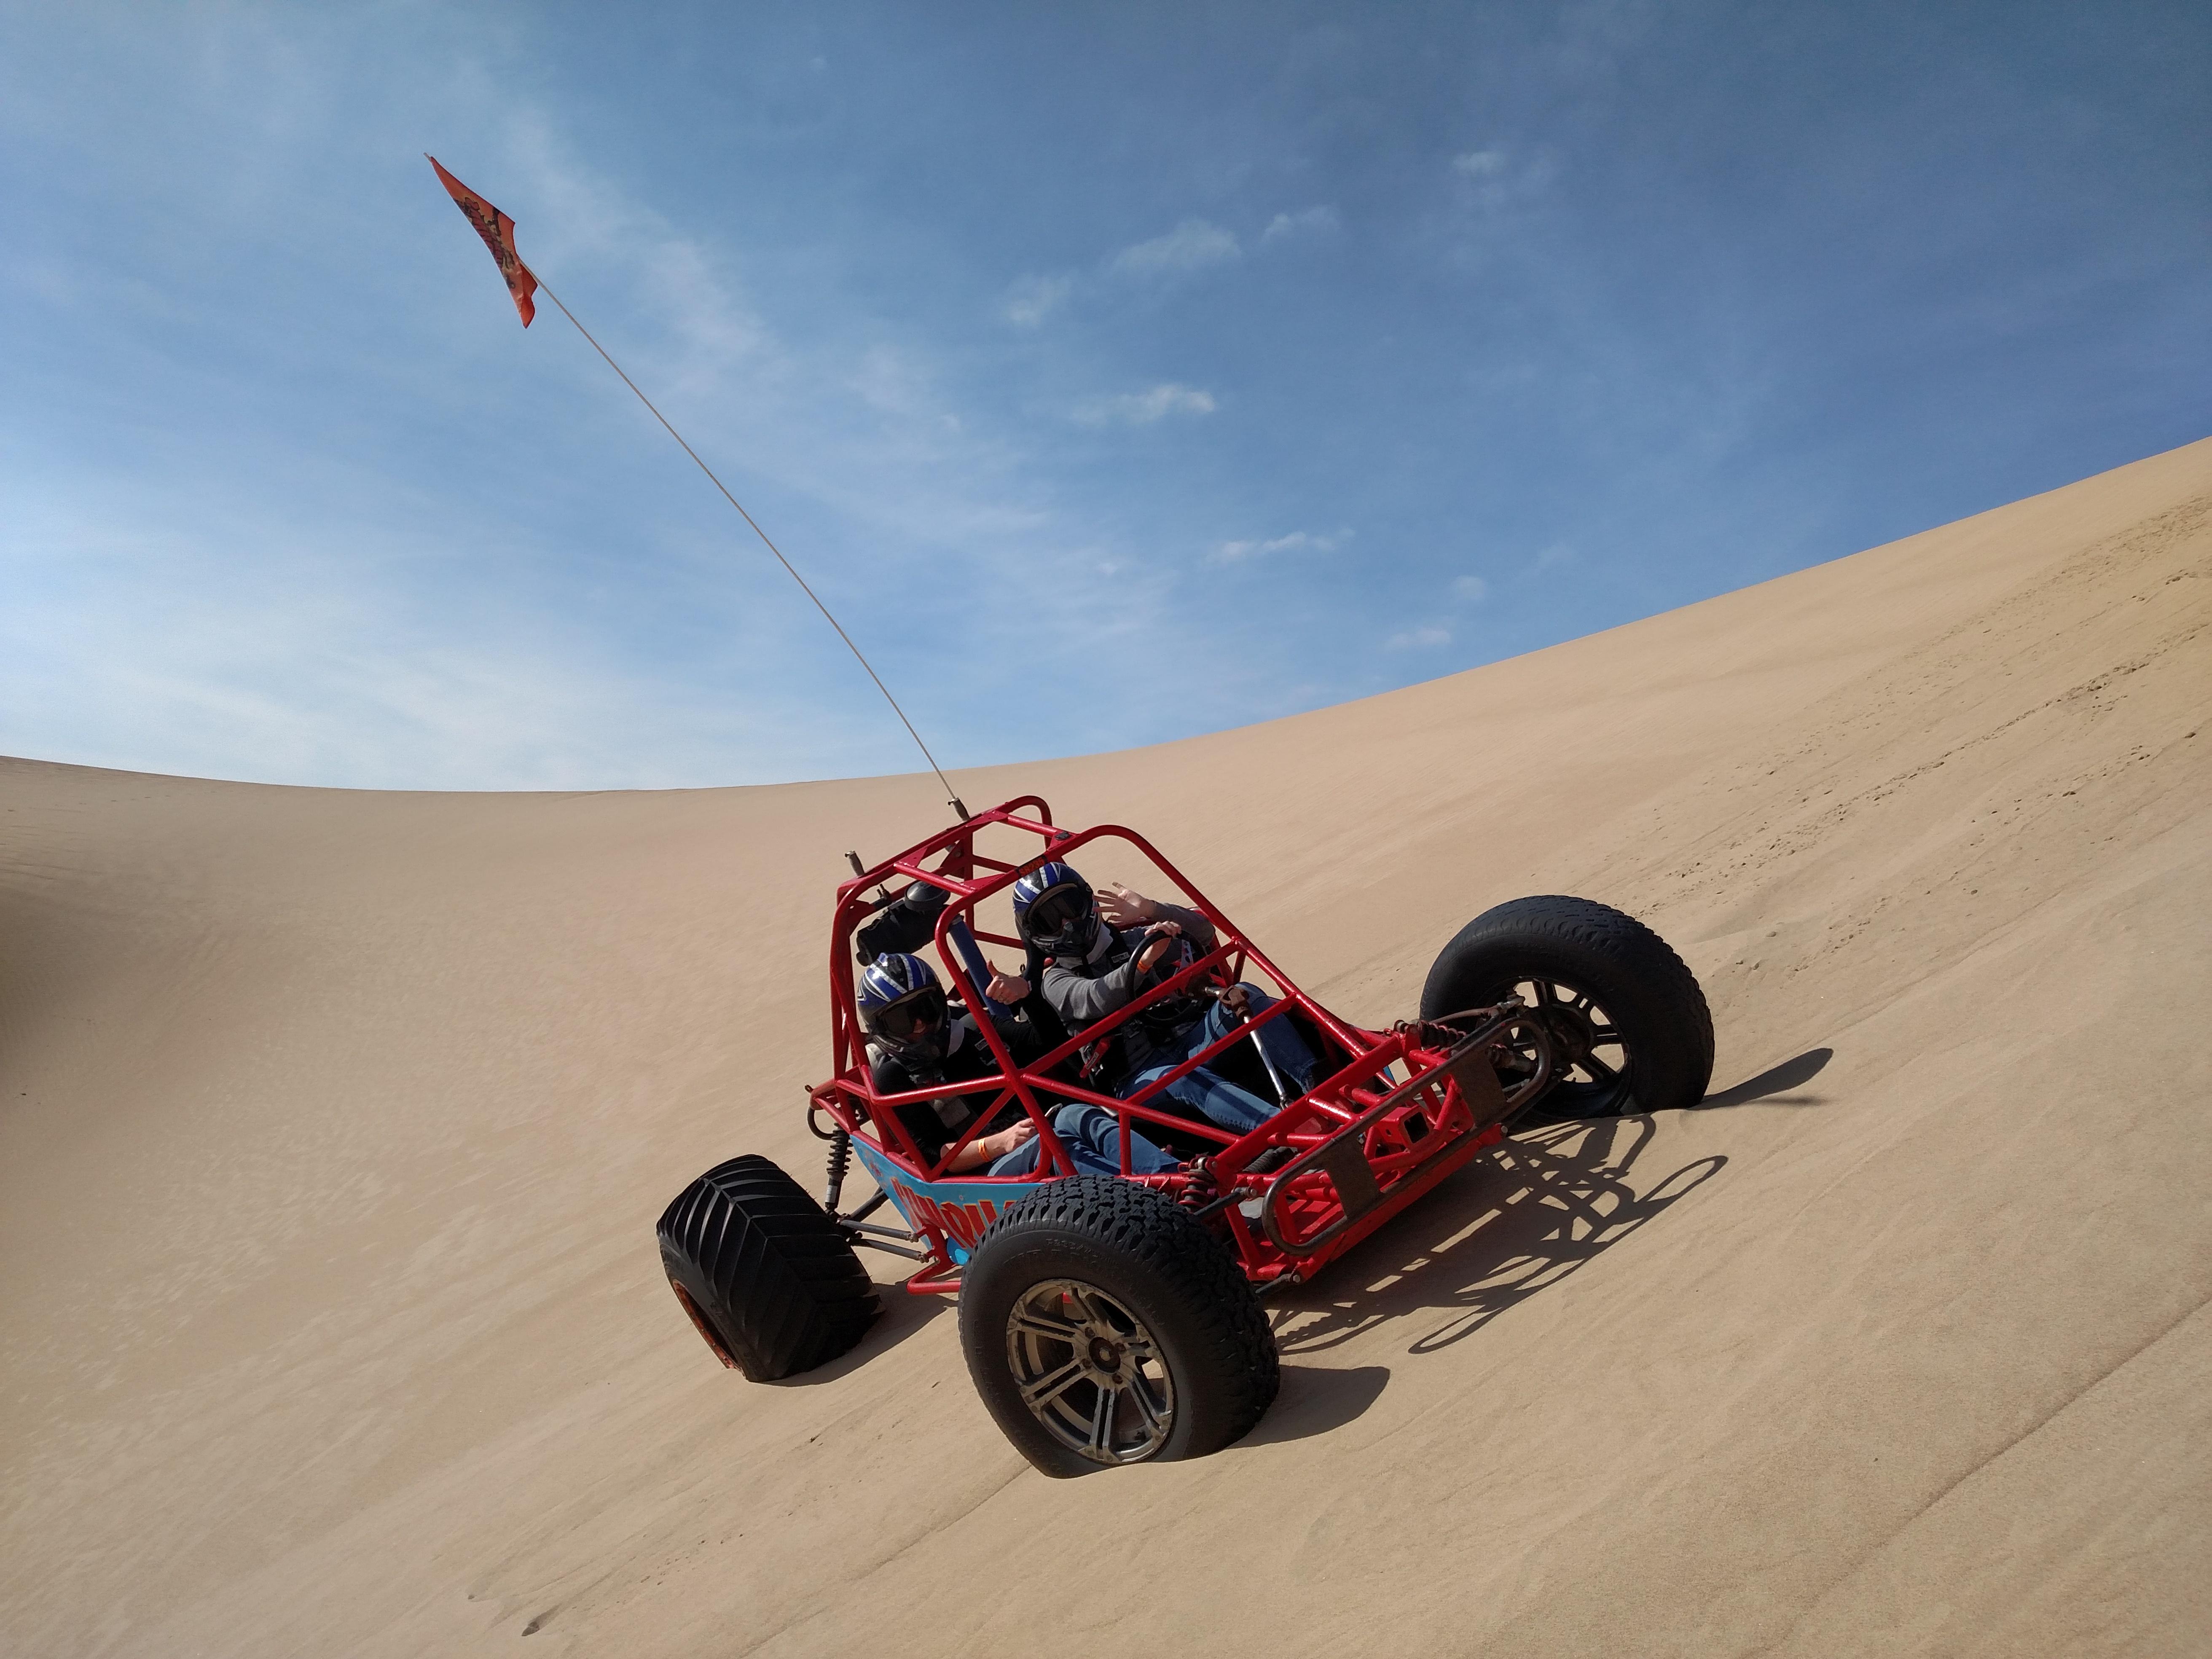 Visit Slo Cal - San Luis Obispo County - dune buggy